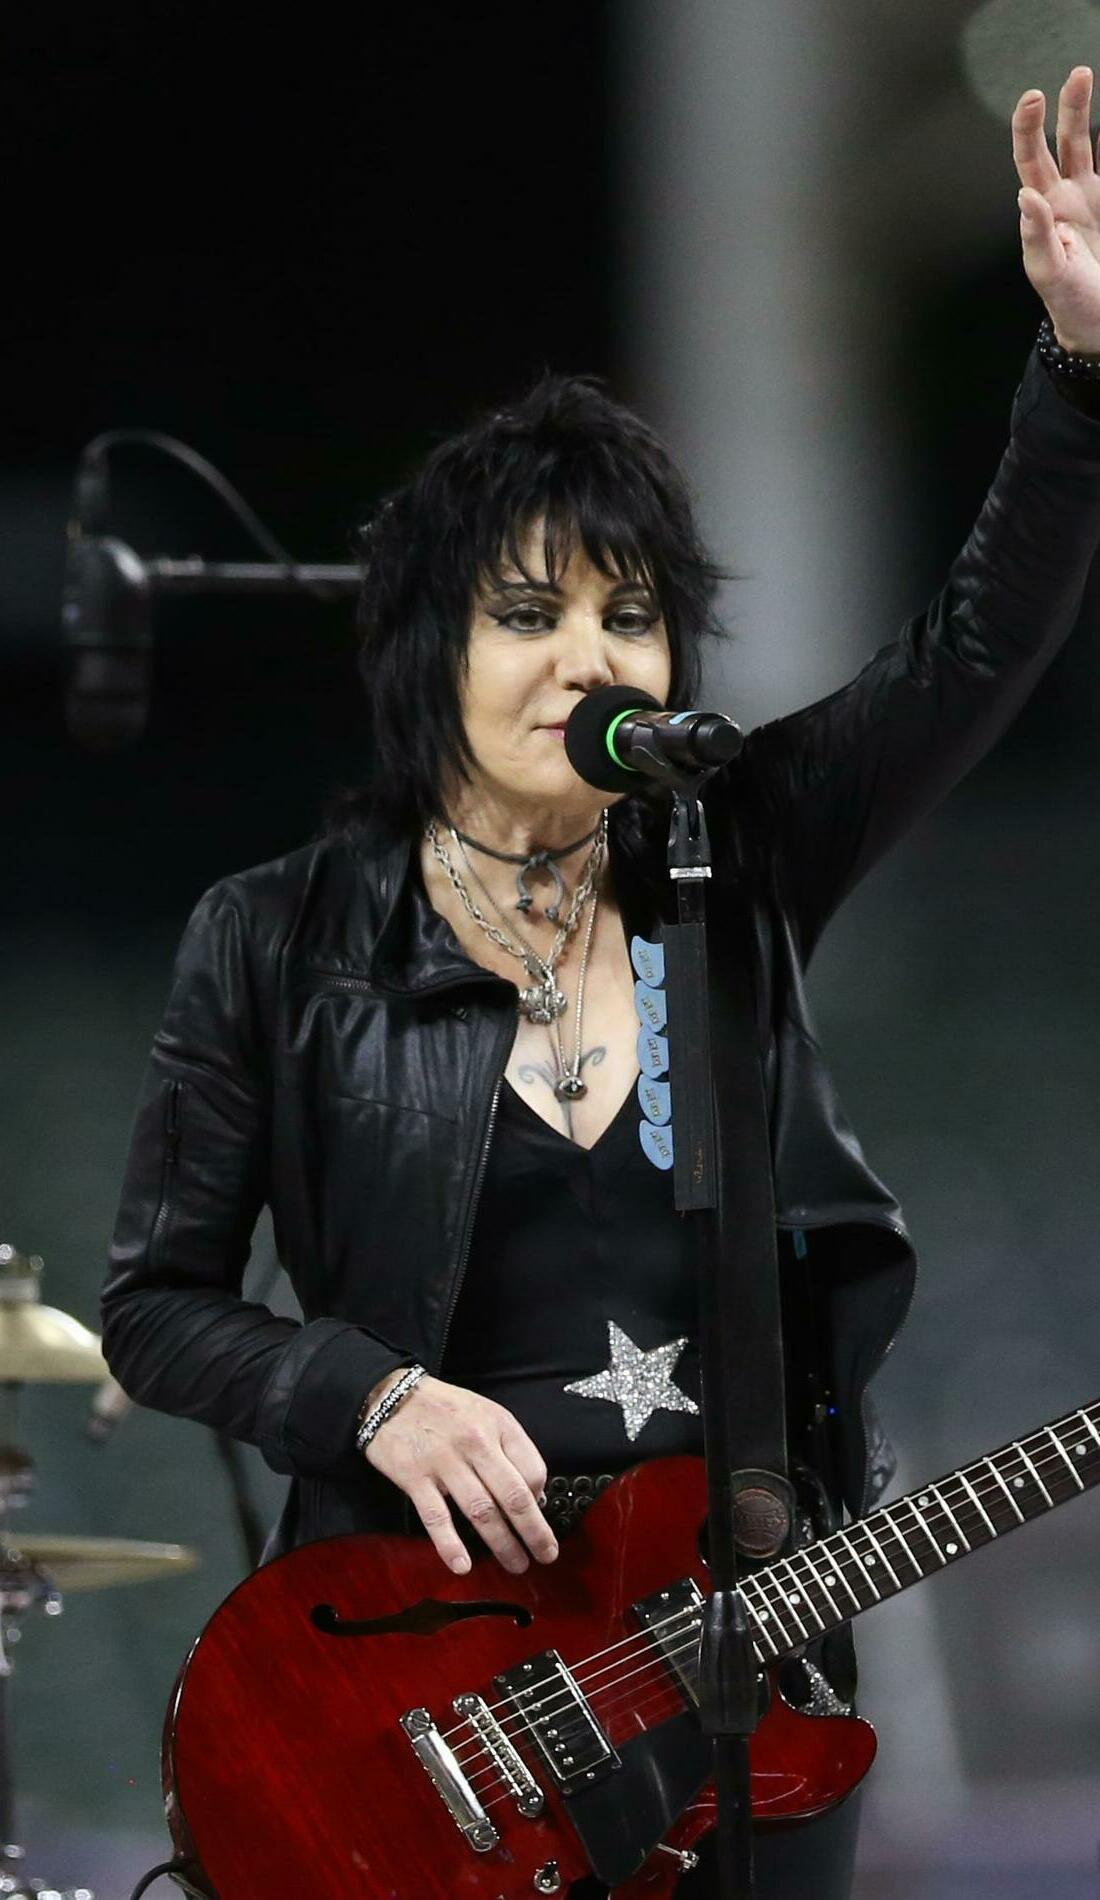 A Joan Jett & The Blackhearts live event